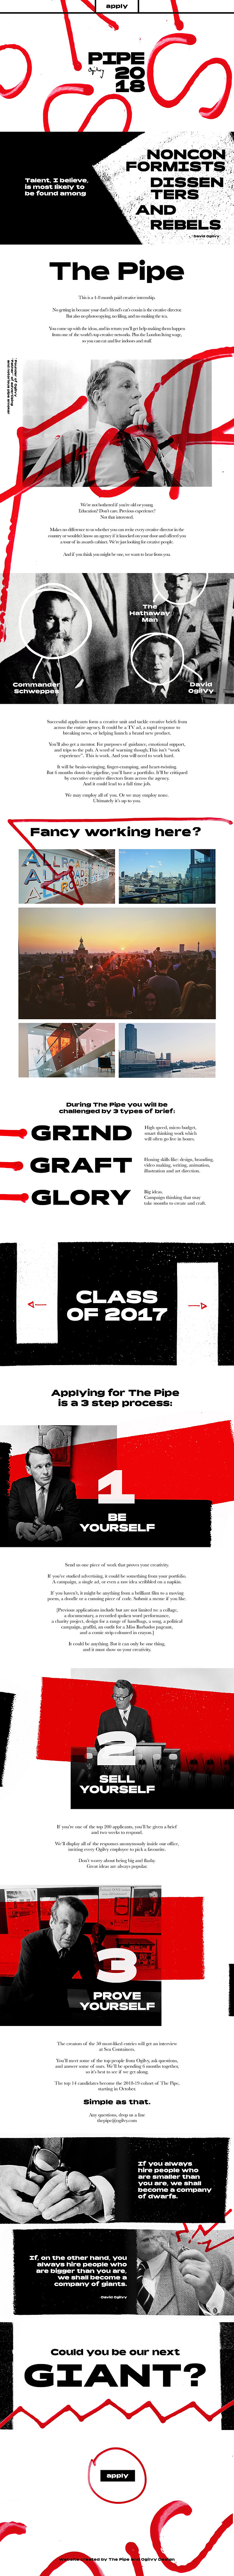 Pipe 2018 Website - Desktop - 10_05_18-m